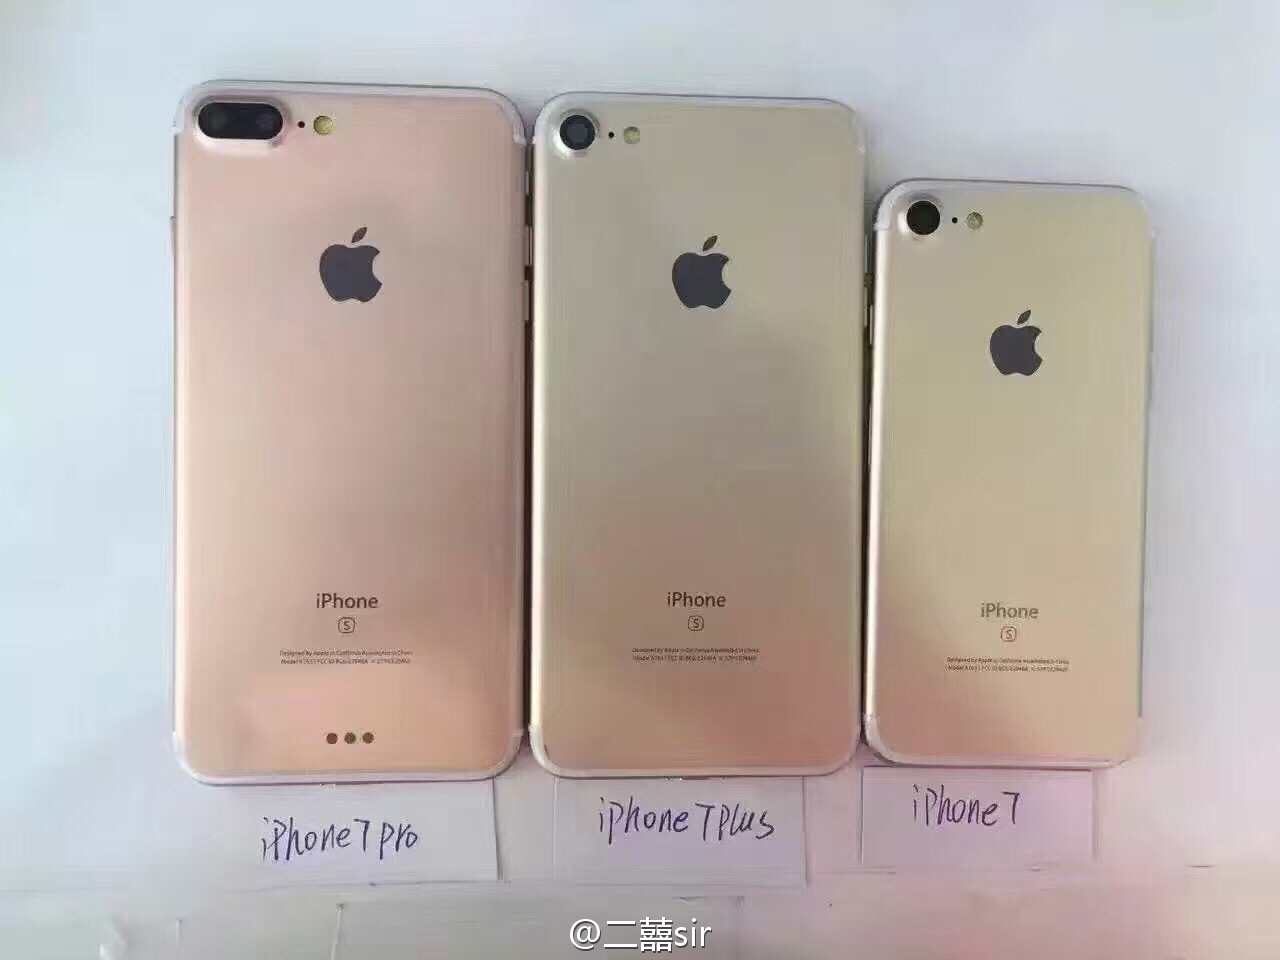 iPhone 7 Pro foto